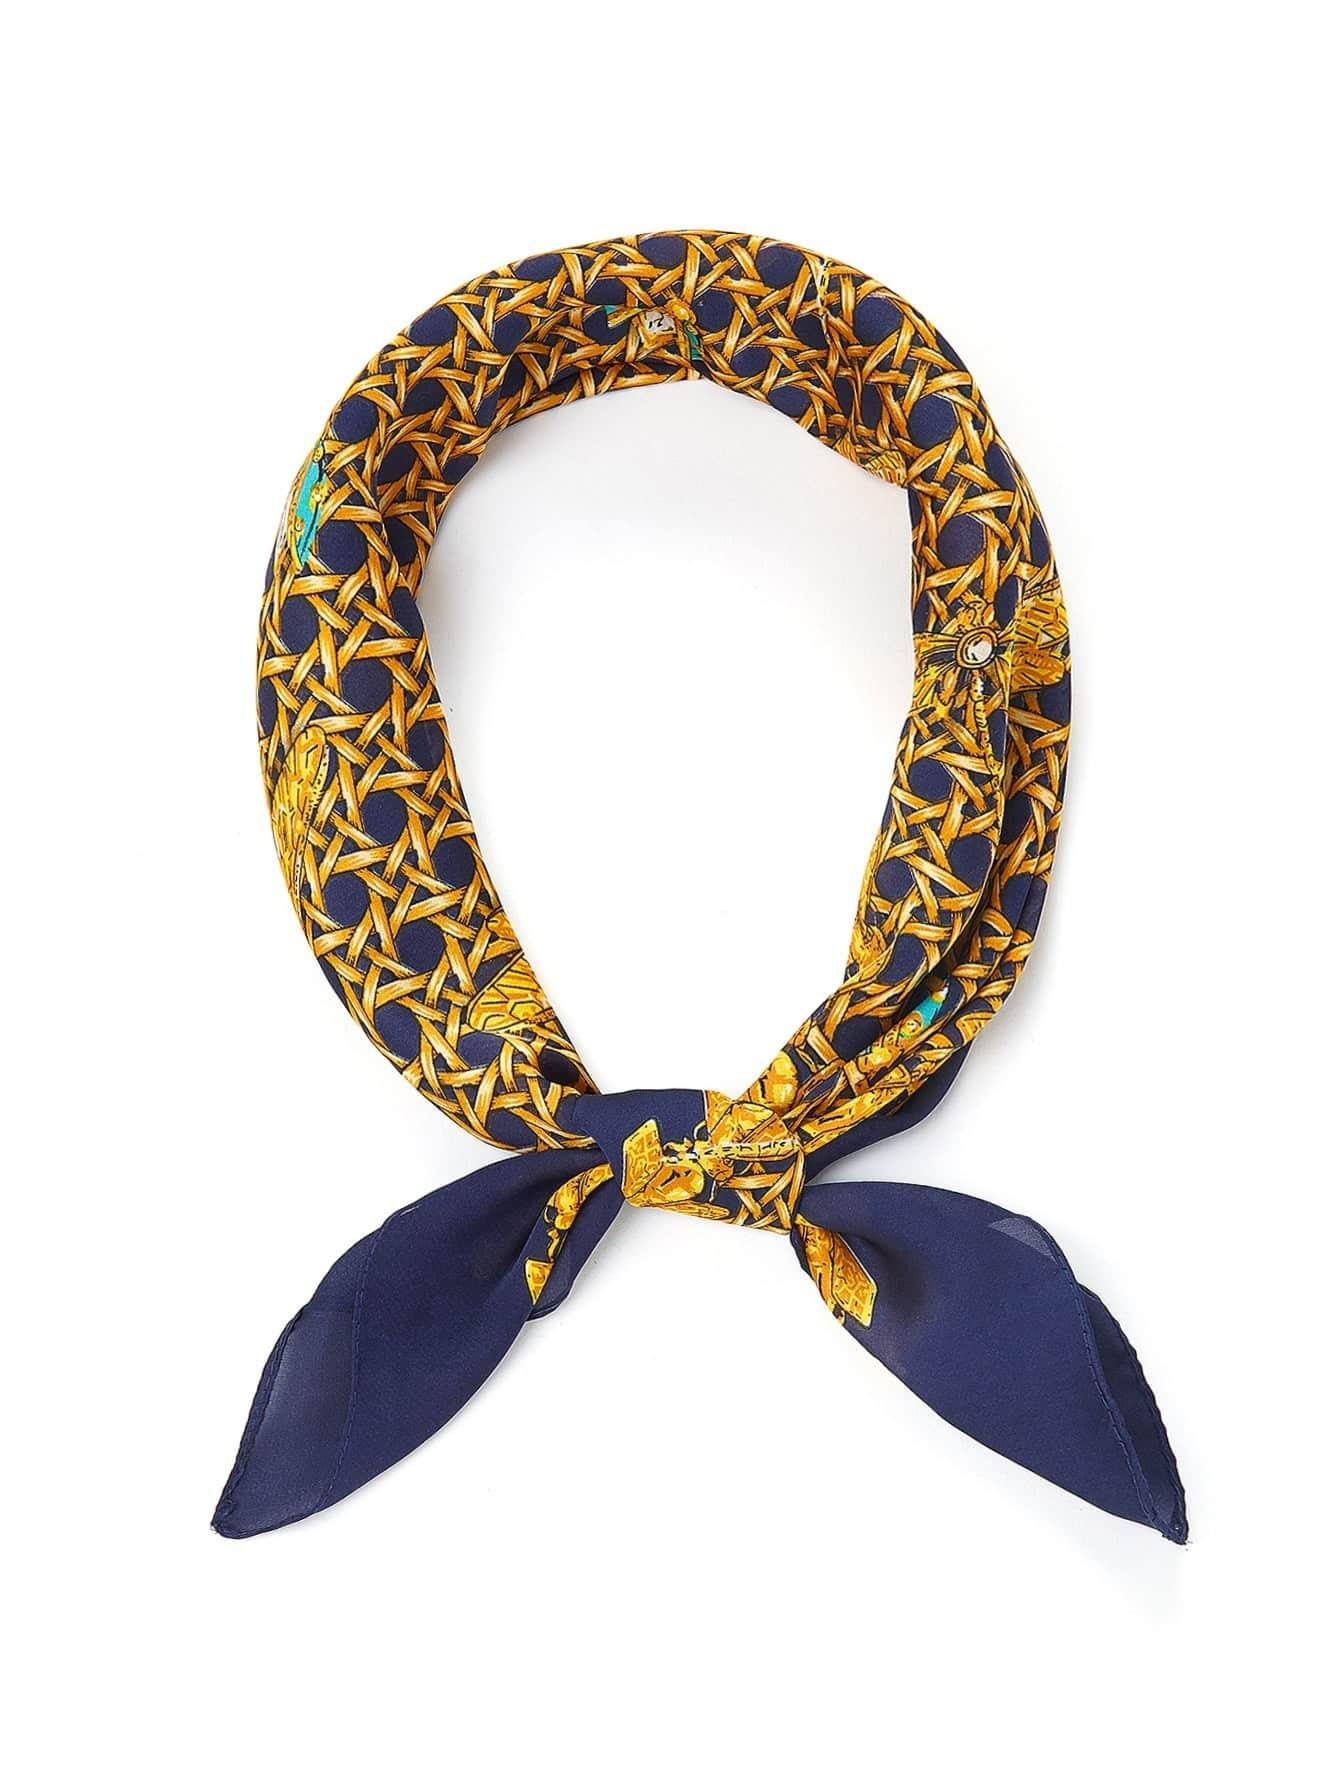 Insect Print Bandana Scarf color block geometric bandana scarf